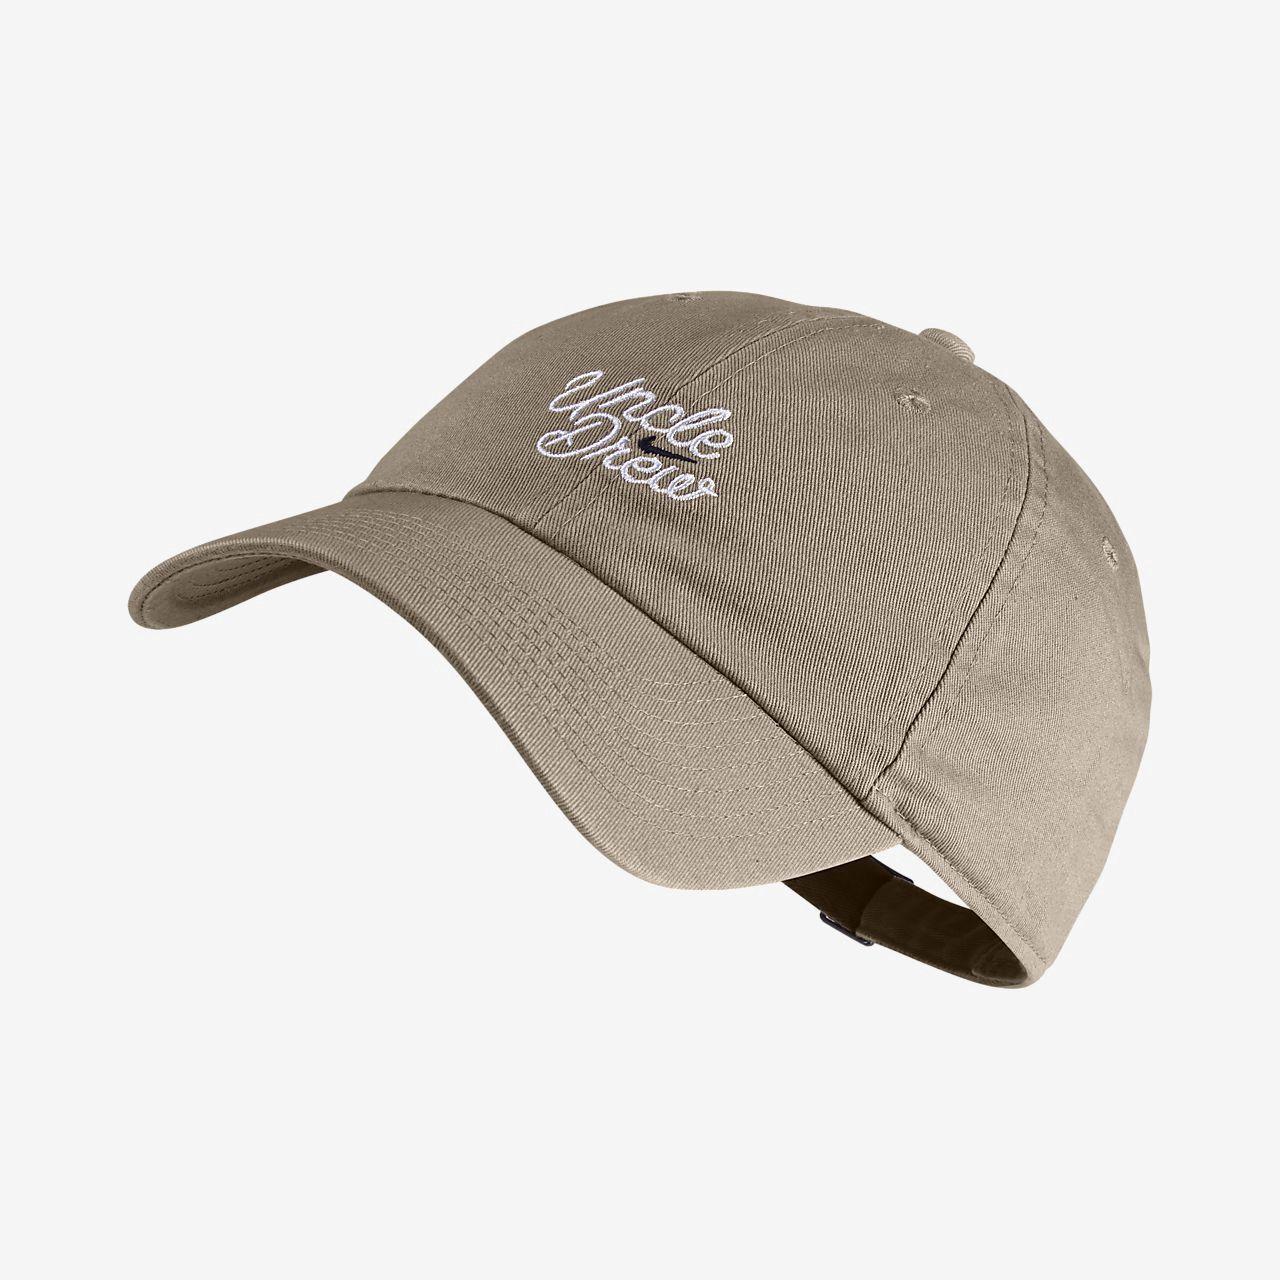 a54e5c84172e2 Nike Kyrie Heritage 86 Hat - Khaki Os